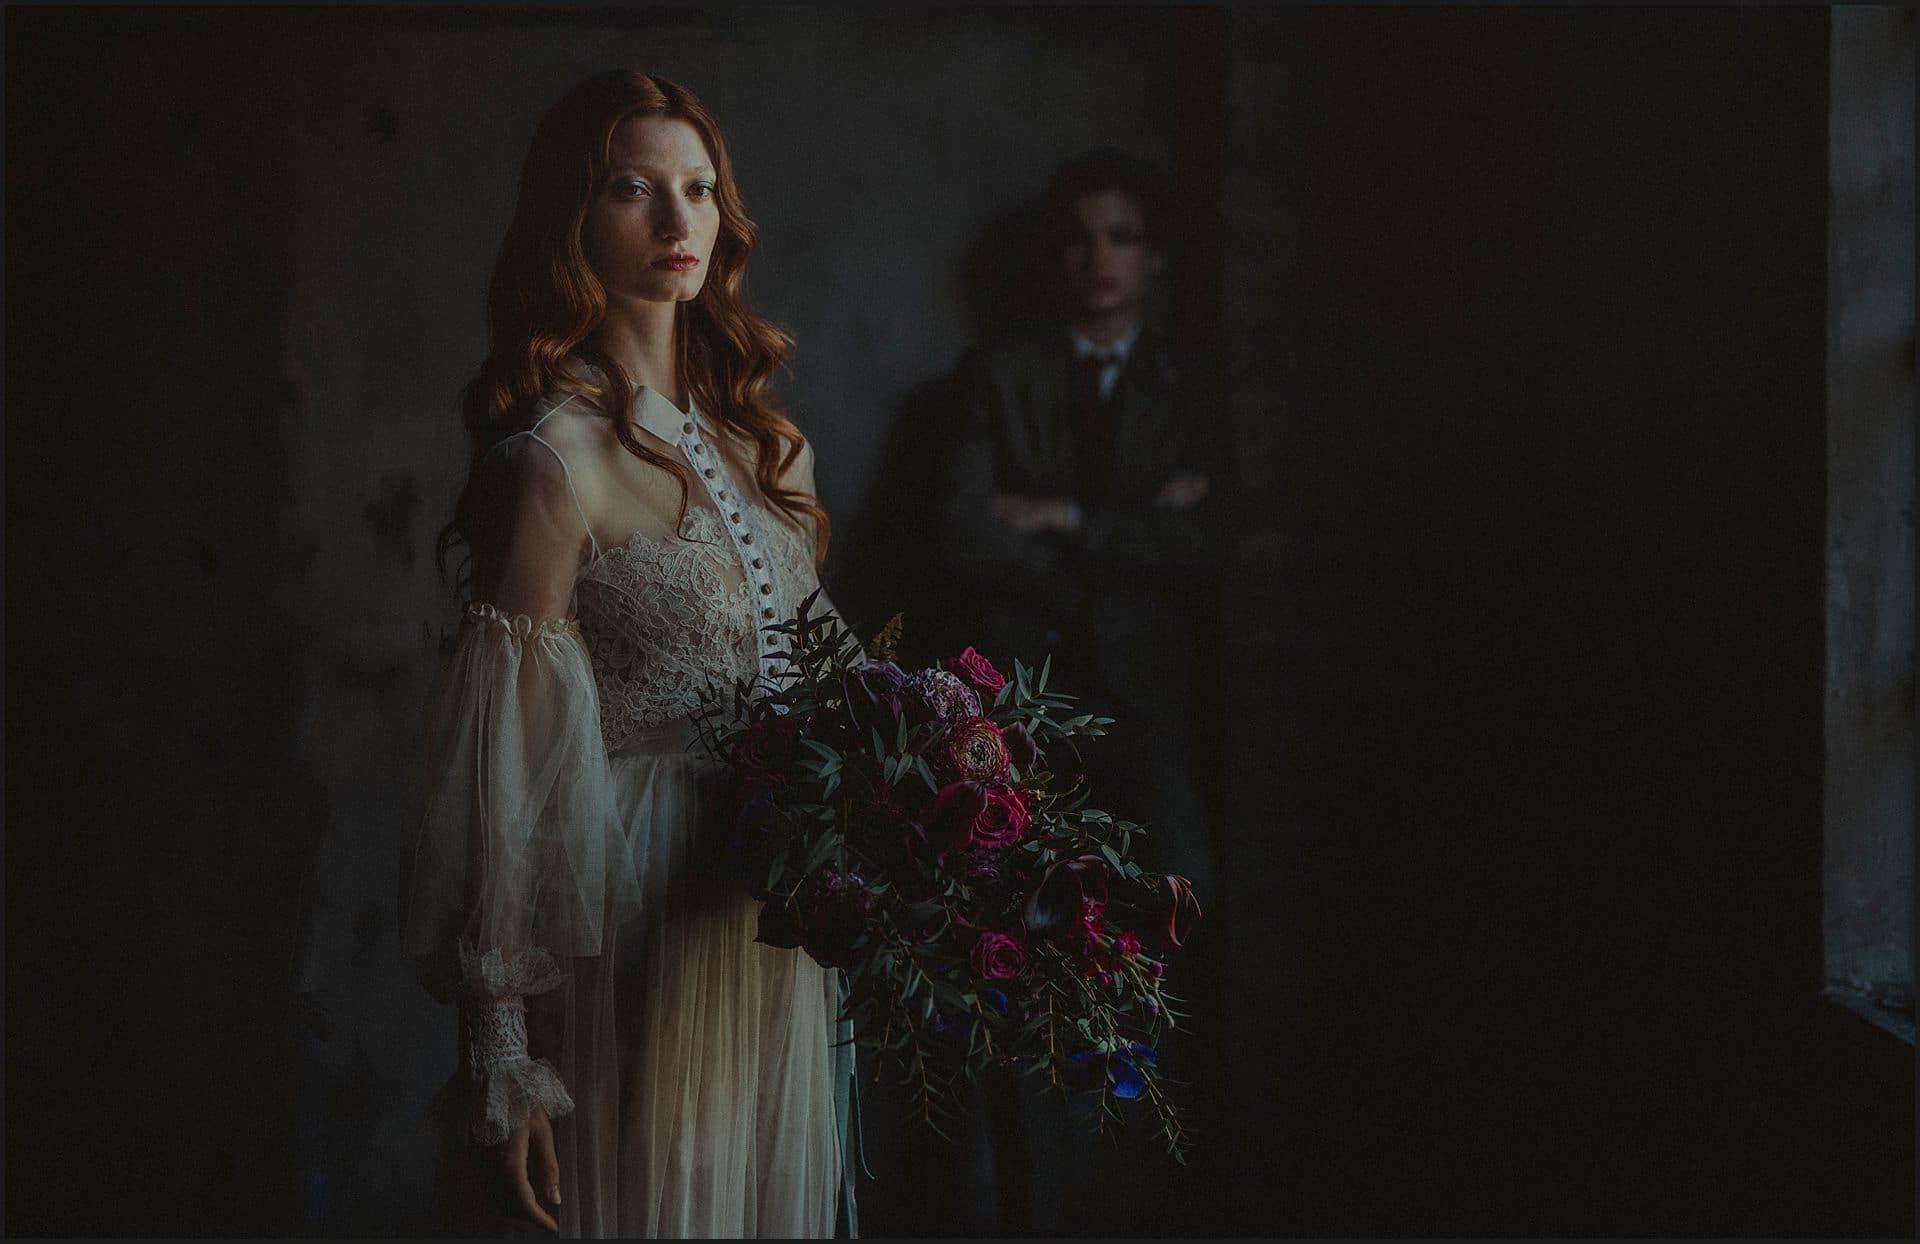 bride portrait, wedding flowers, bouquet, unconventional wedding, cross studio, milan, wedding photographer, wedding in italy